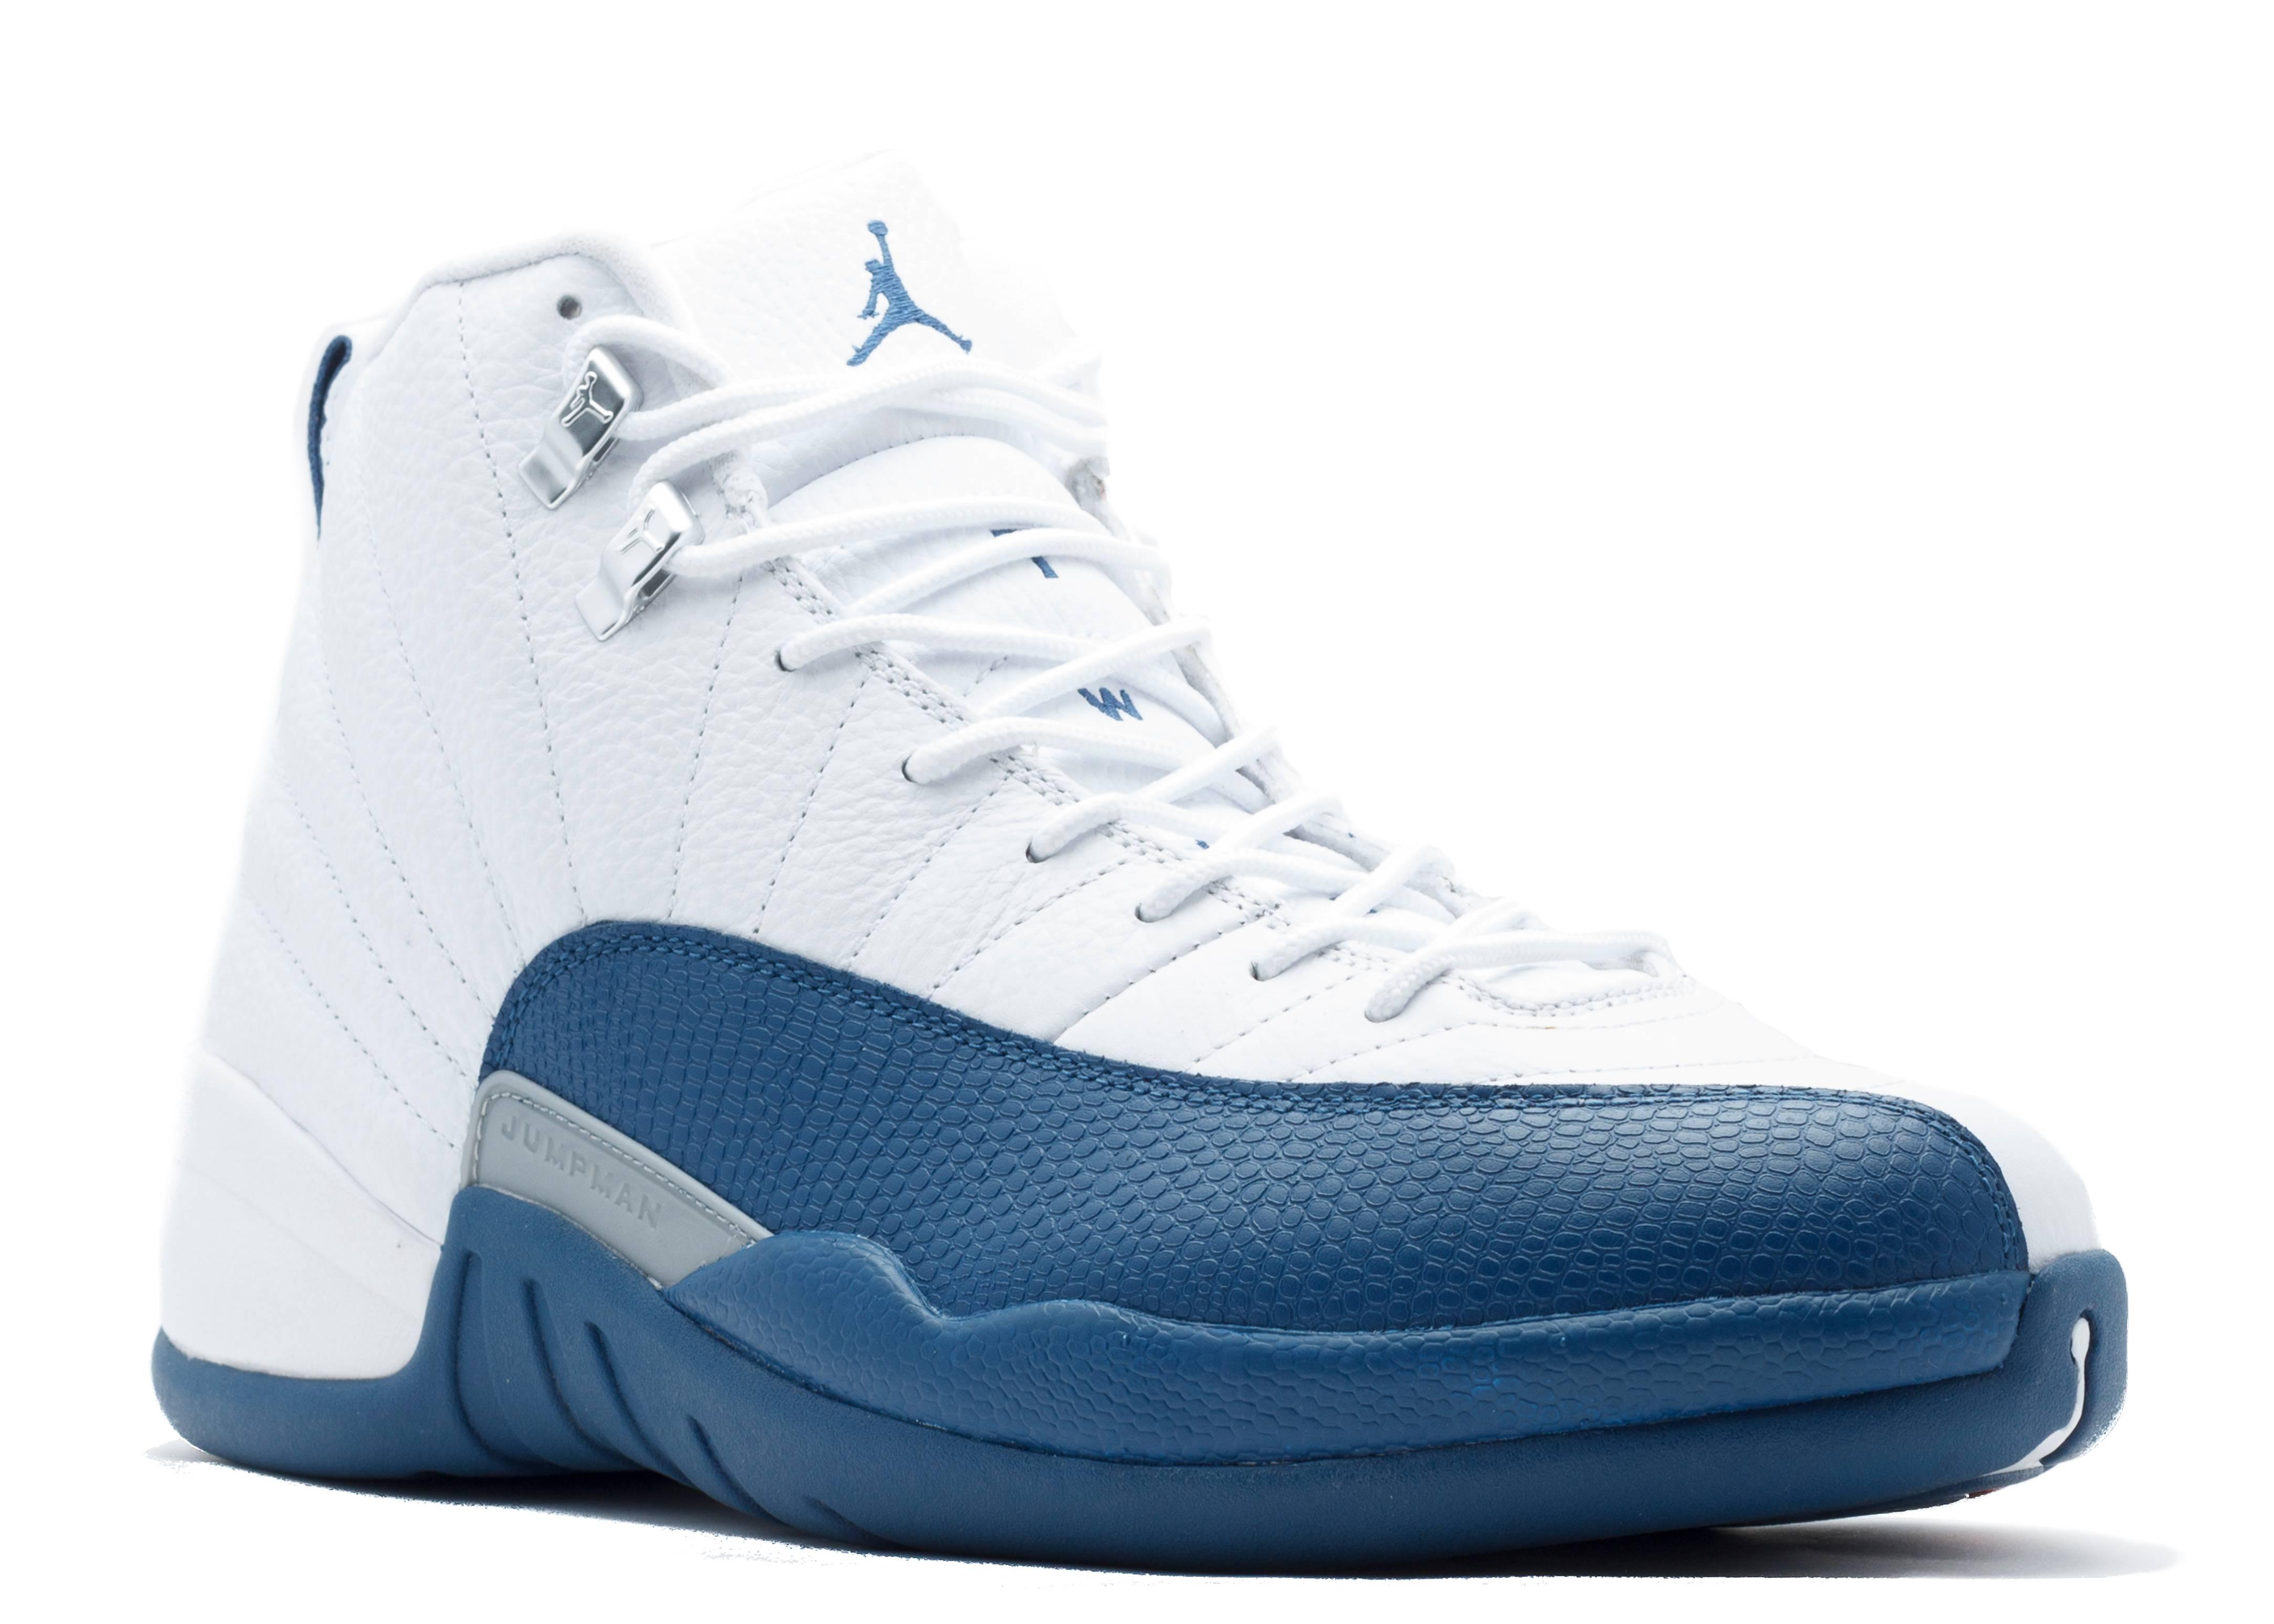 jordan nike schuhe günstig online kaufen, Nike Air Jordan 12